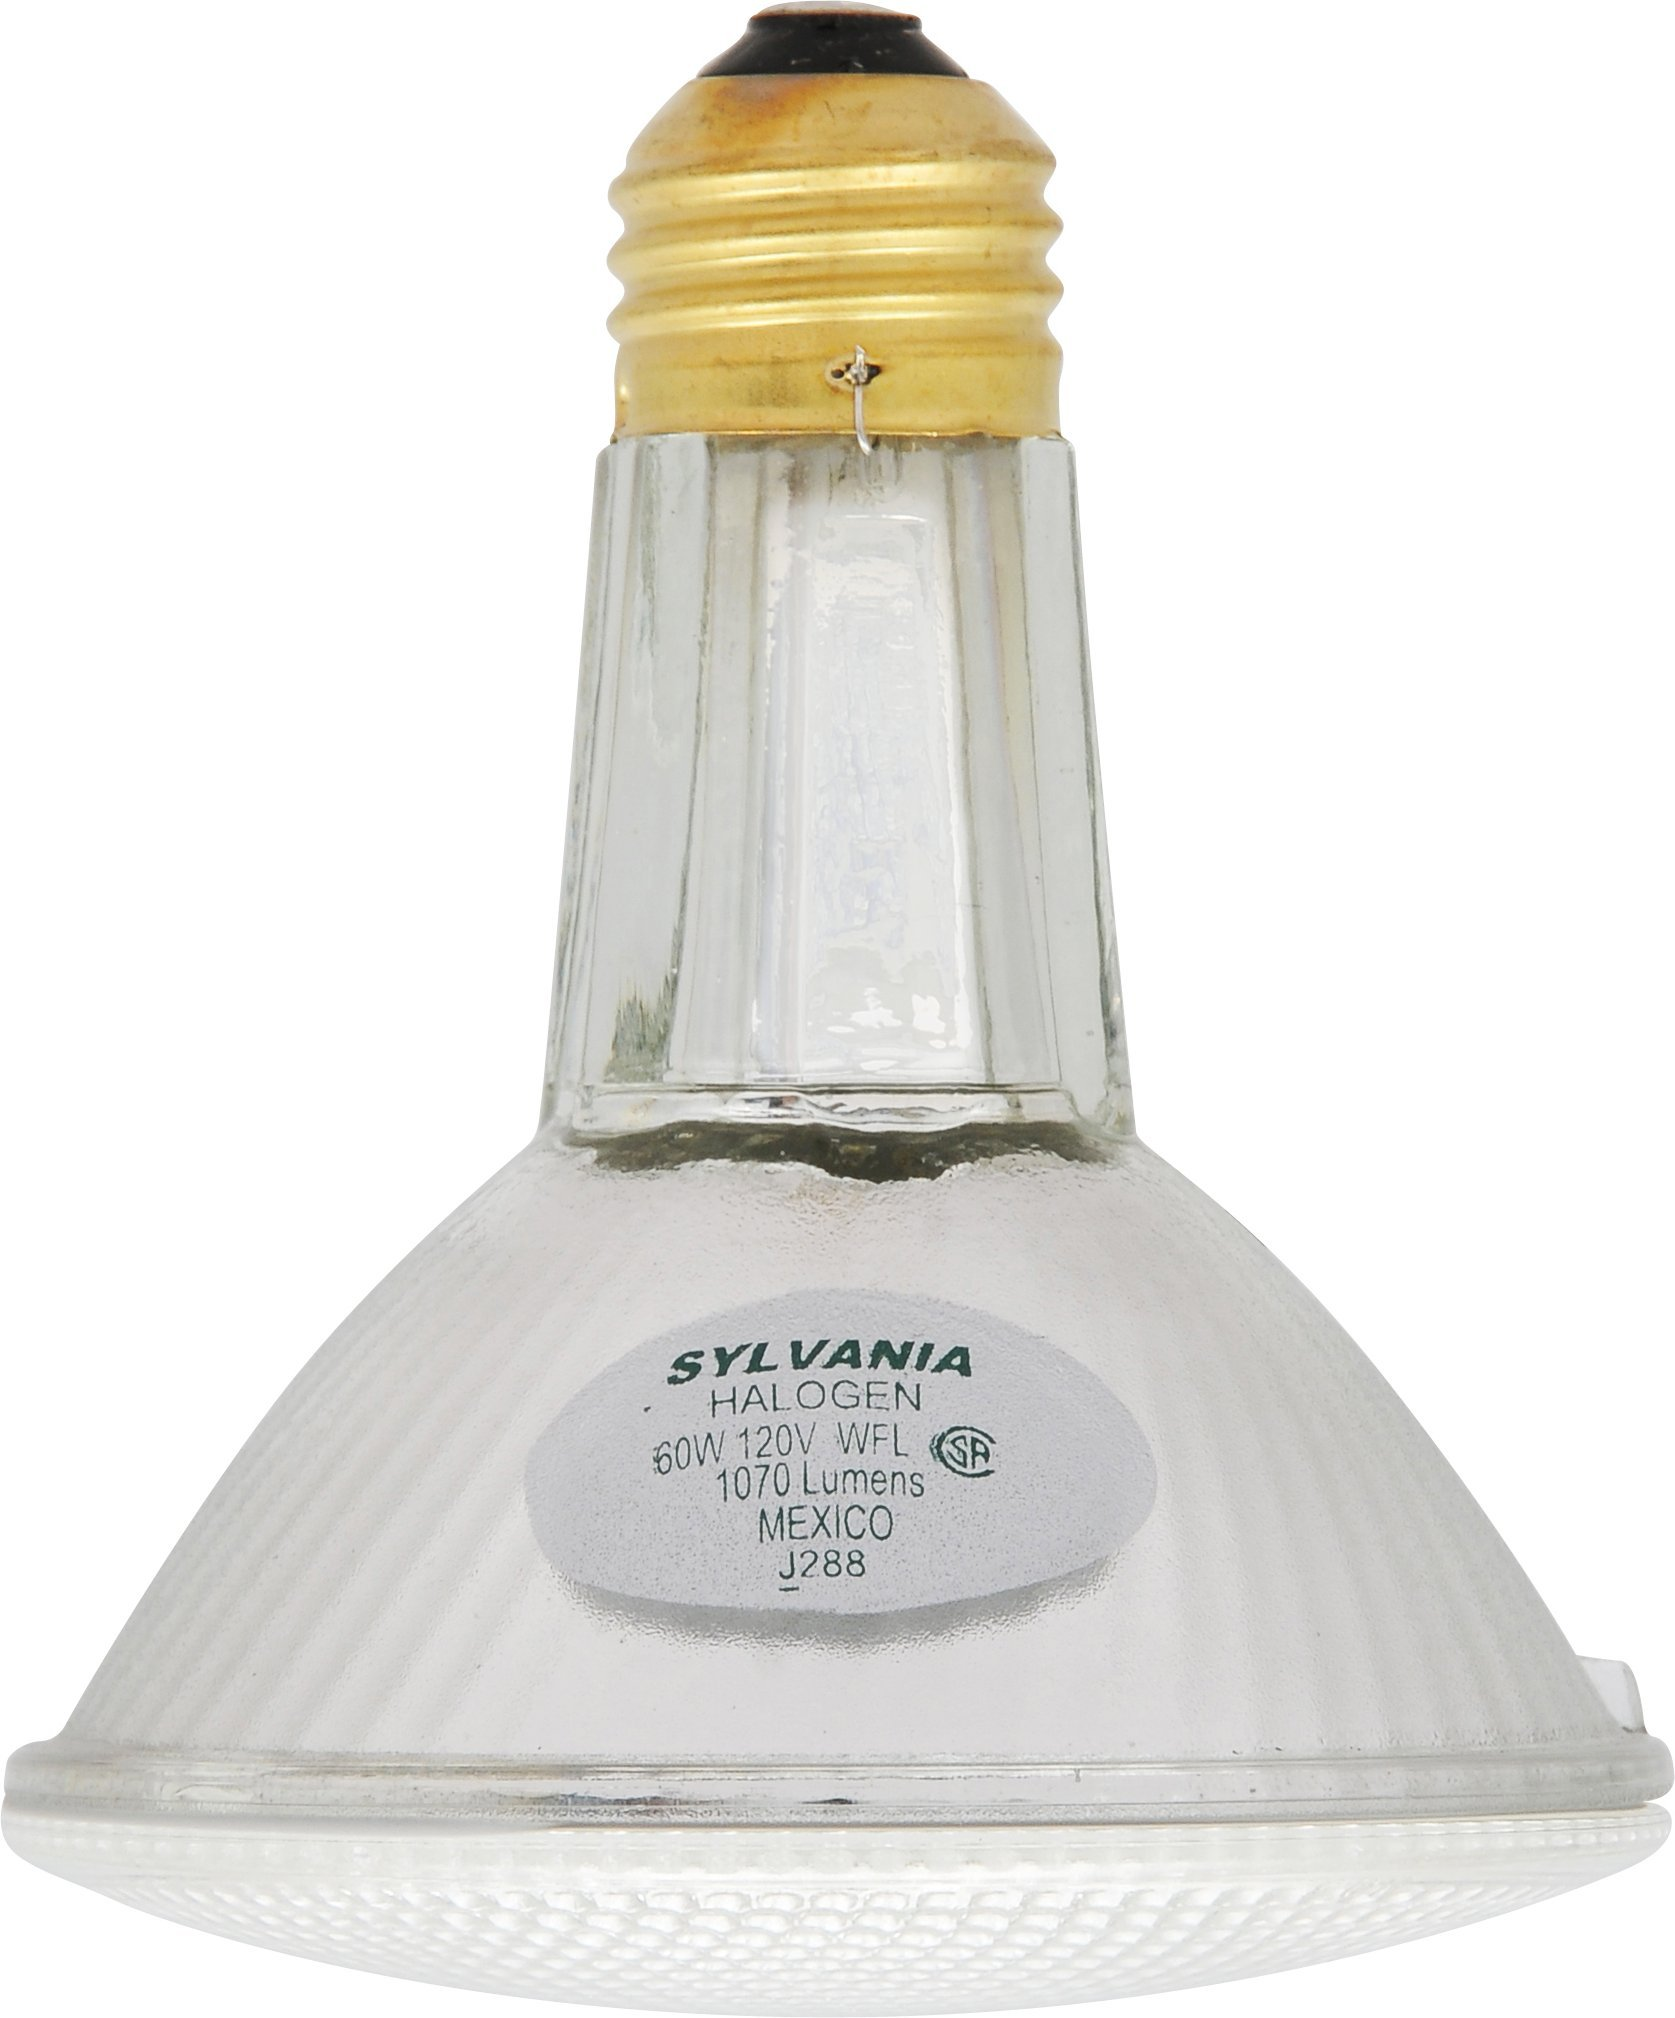 SYLVANIA Capsylite Long Neck Halogen Bulb Dimmable, PAR30 Reflector Wide Flood Light, E26 Medium Base, 60W, Warm White 2900K, 6 Pack